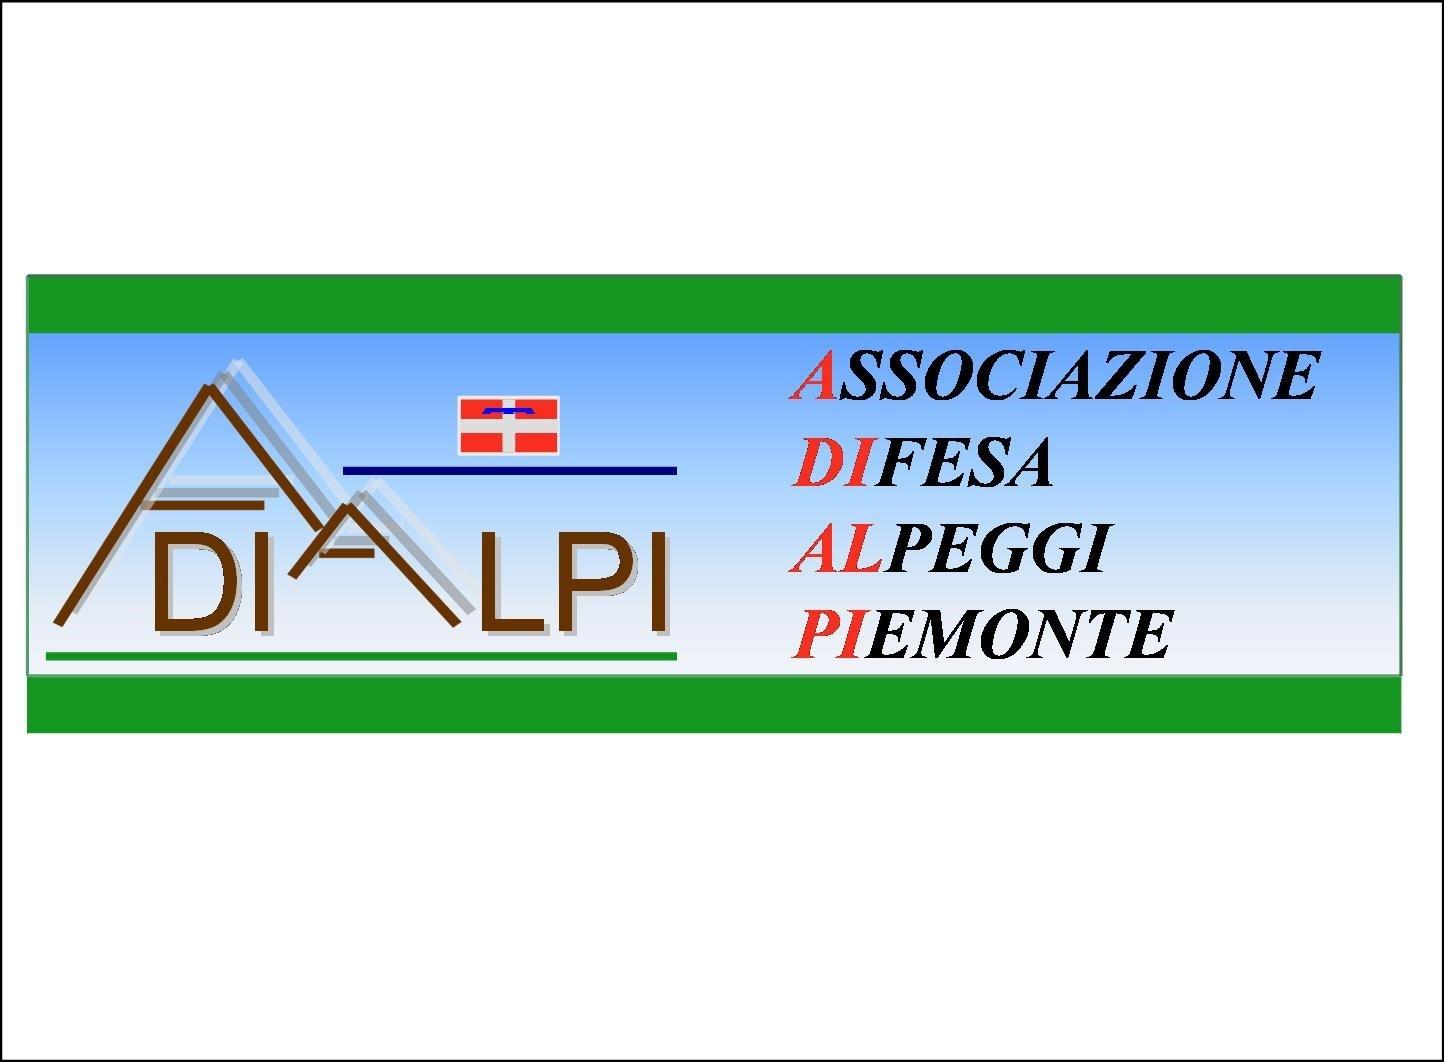 Ass. Difesa Alpeggi Piemonte